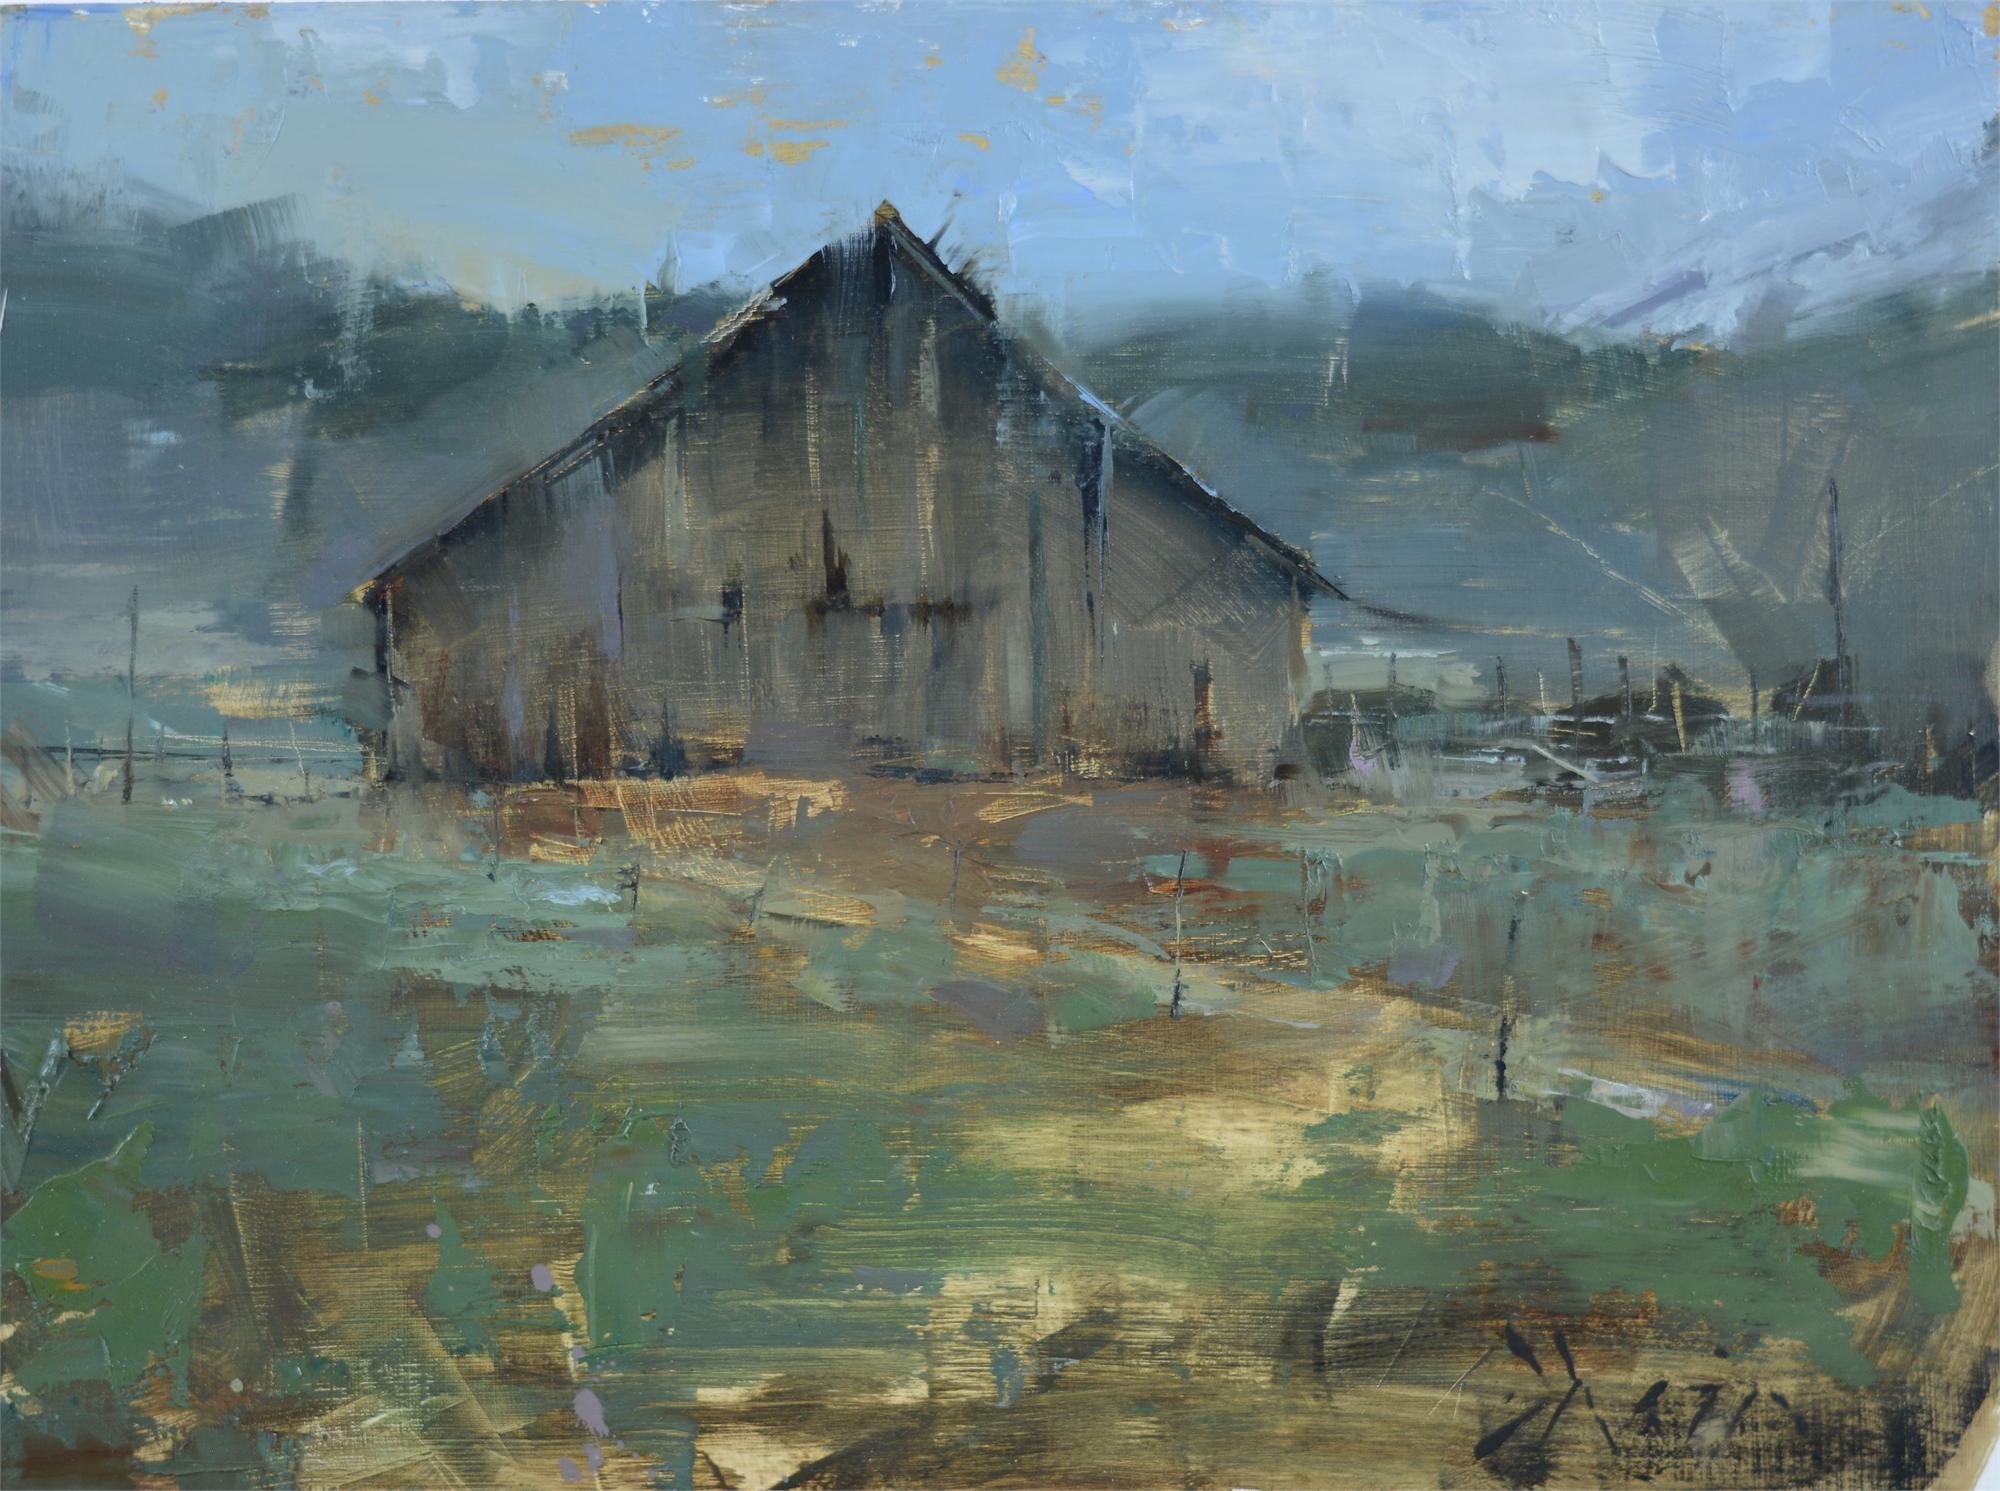 Rustic Barn in Reno by Jacob Dhein